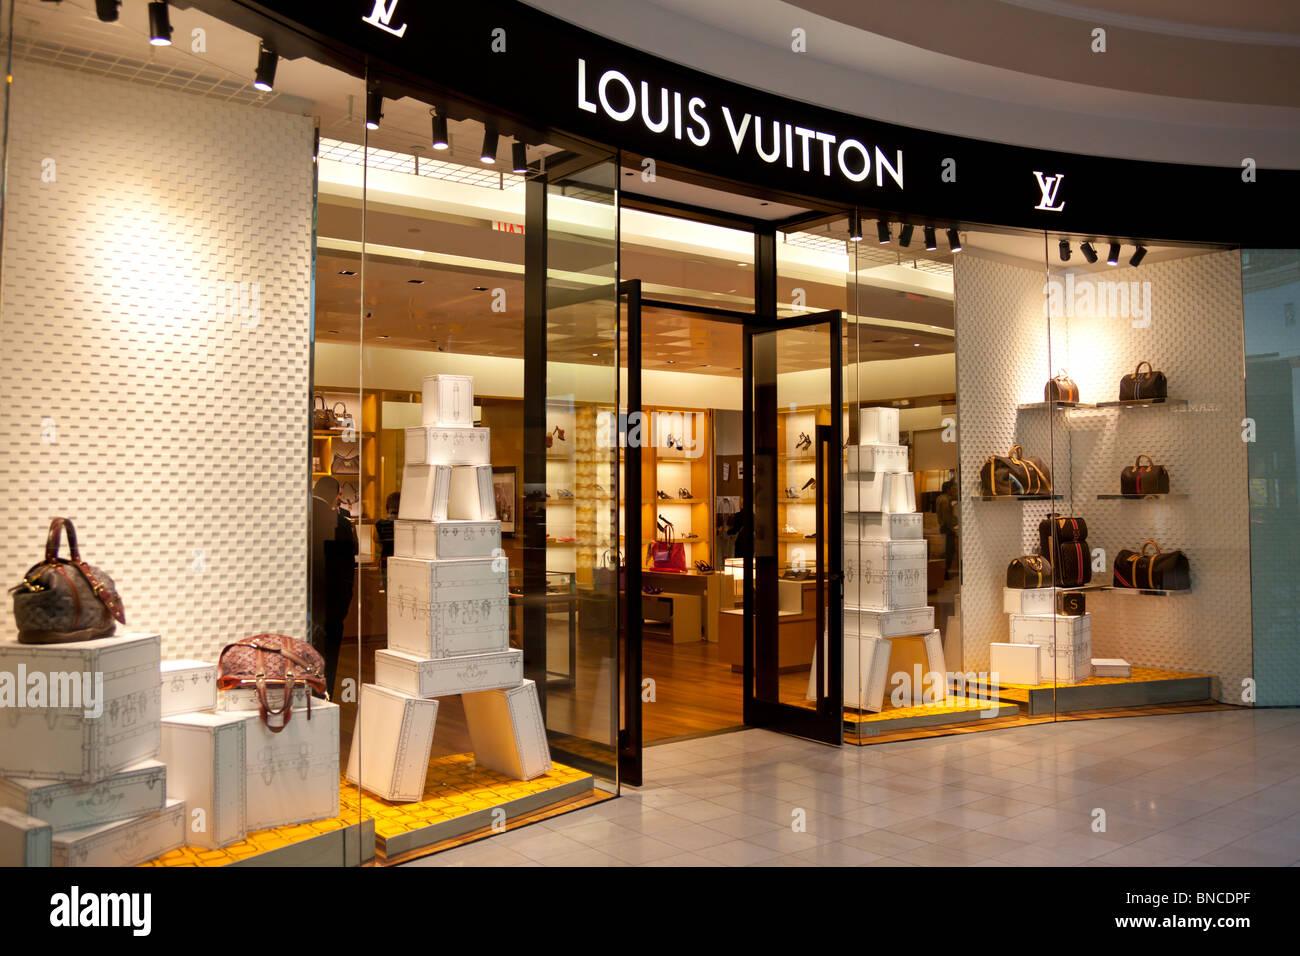 Almacén de Louis Vuitton, King of Prussia Mall, cerca de Philadelphia, PA, USA Foto de stock